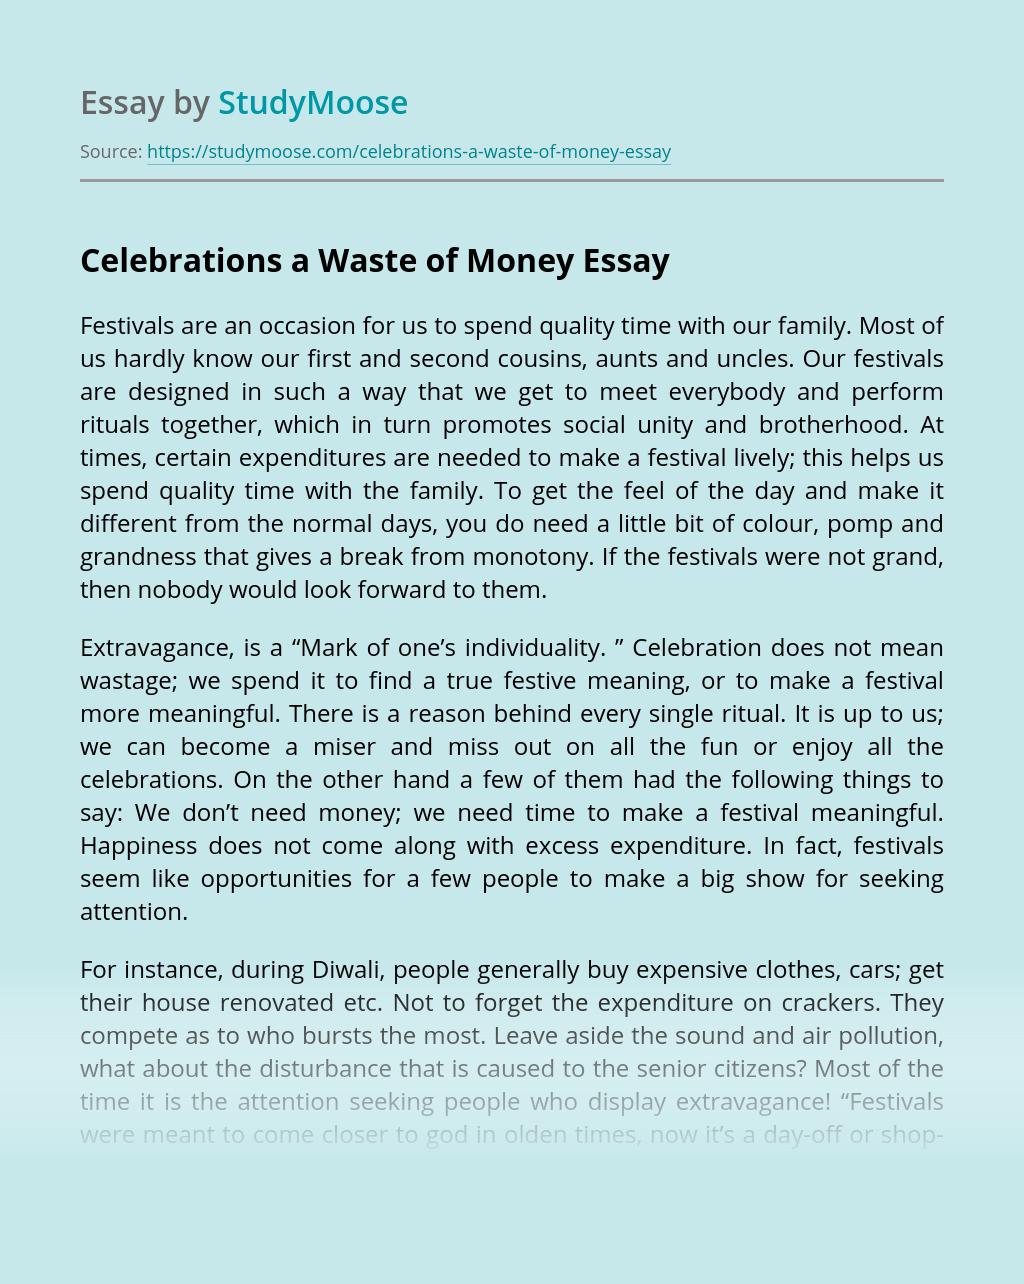 Celebrations a Waste of Money